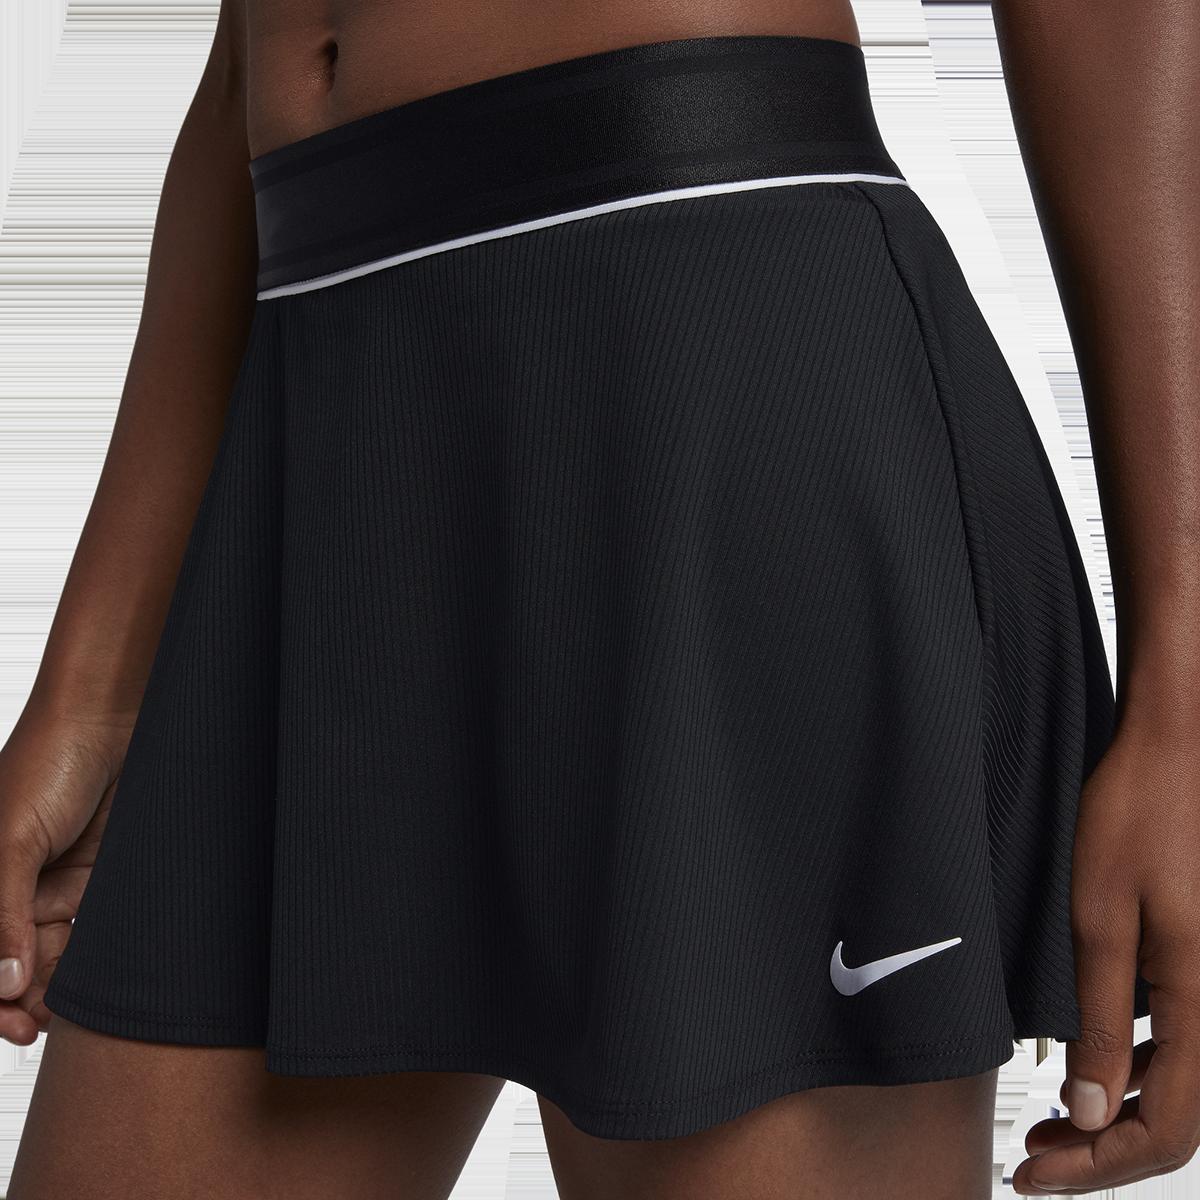 Nikecourt Dri Fit Flouncy Tennis Skirt Pga Tour Superstore Flat, elastic waistband stretches for a secure, flattering fit. dri fit flouncy tennis skirt